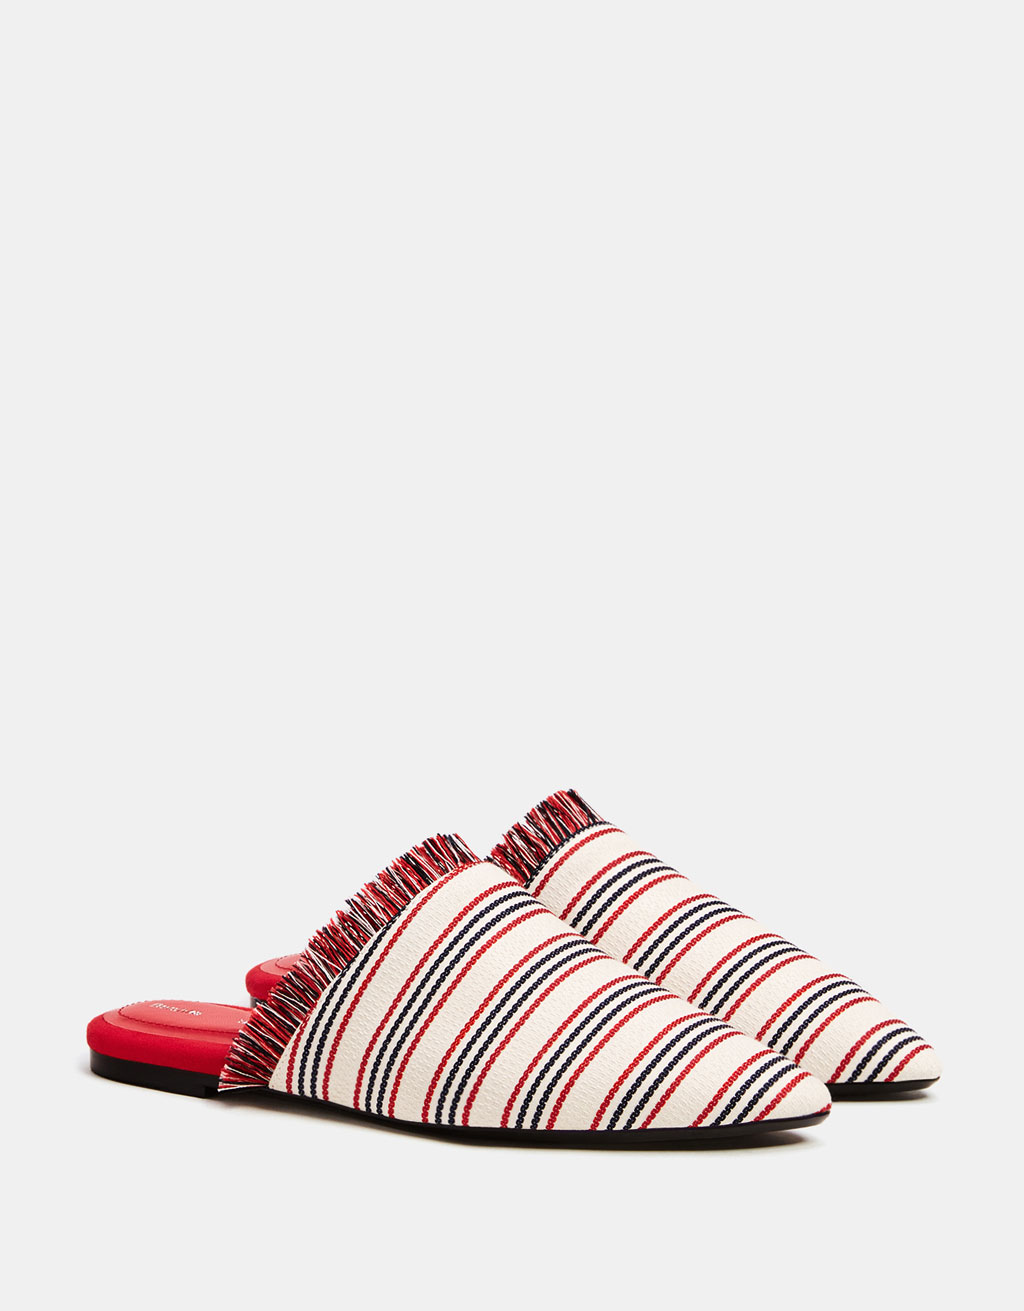 Zapato plano destalonado tecido